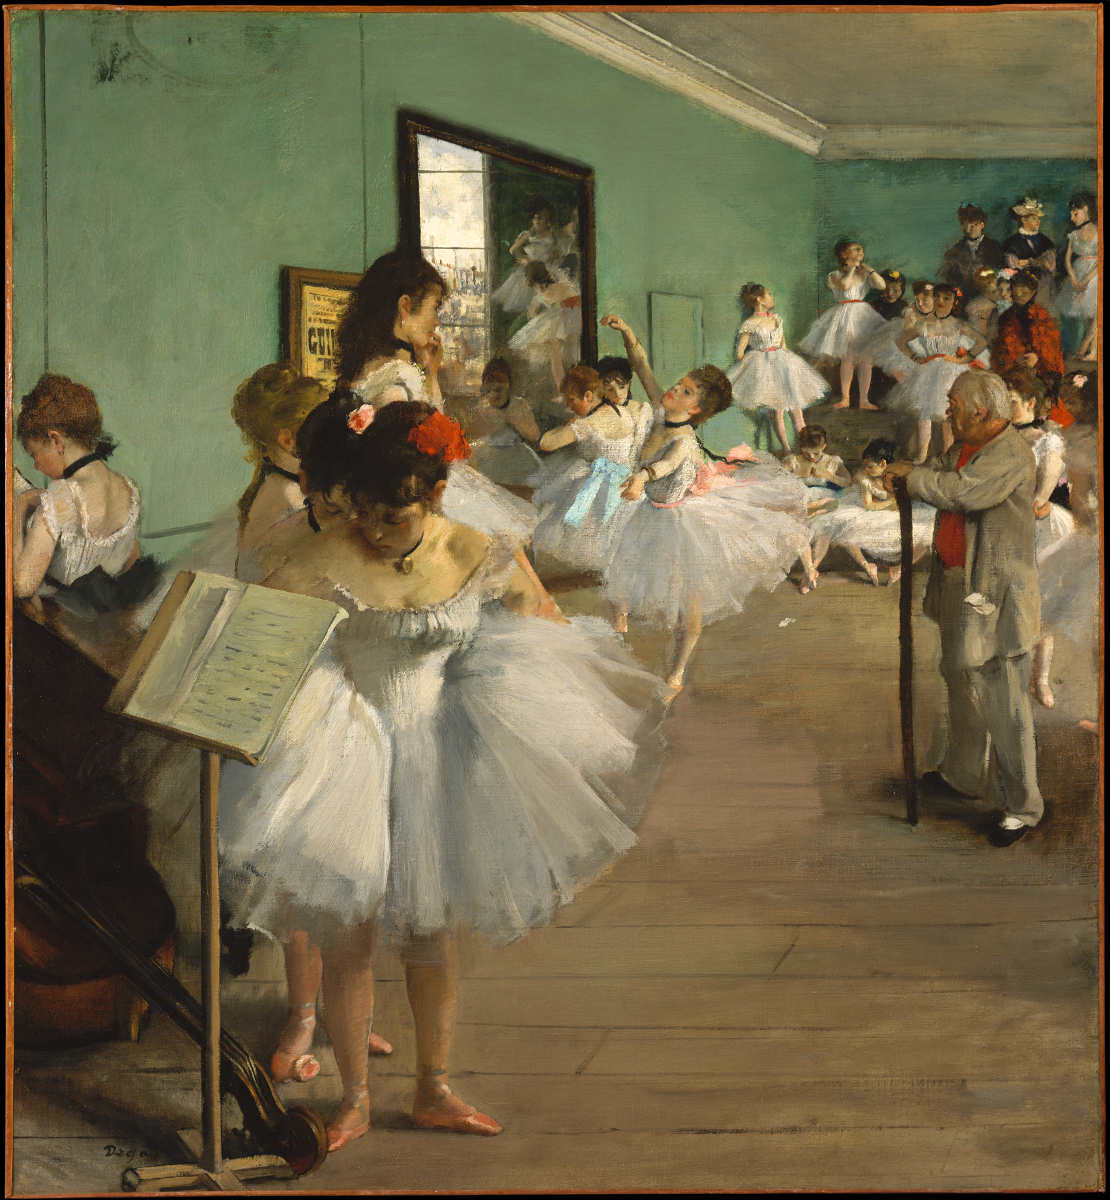 Edgar Degas, Examen de danse, 1874, Öl auf Leinwand, 83.5 x 77.2 cm (Metropolitan Museum of Art, New York, Bequest of Mrs. Harry Payne Bingham, 1986)